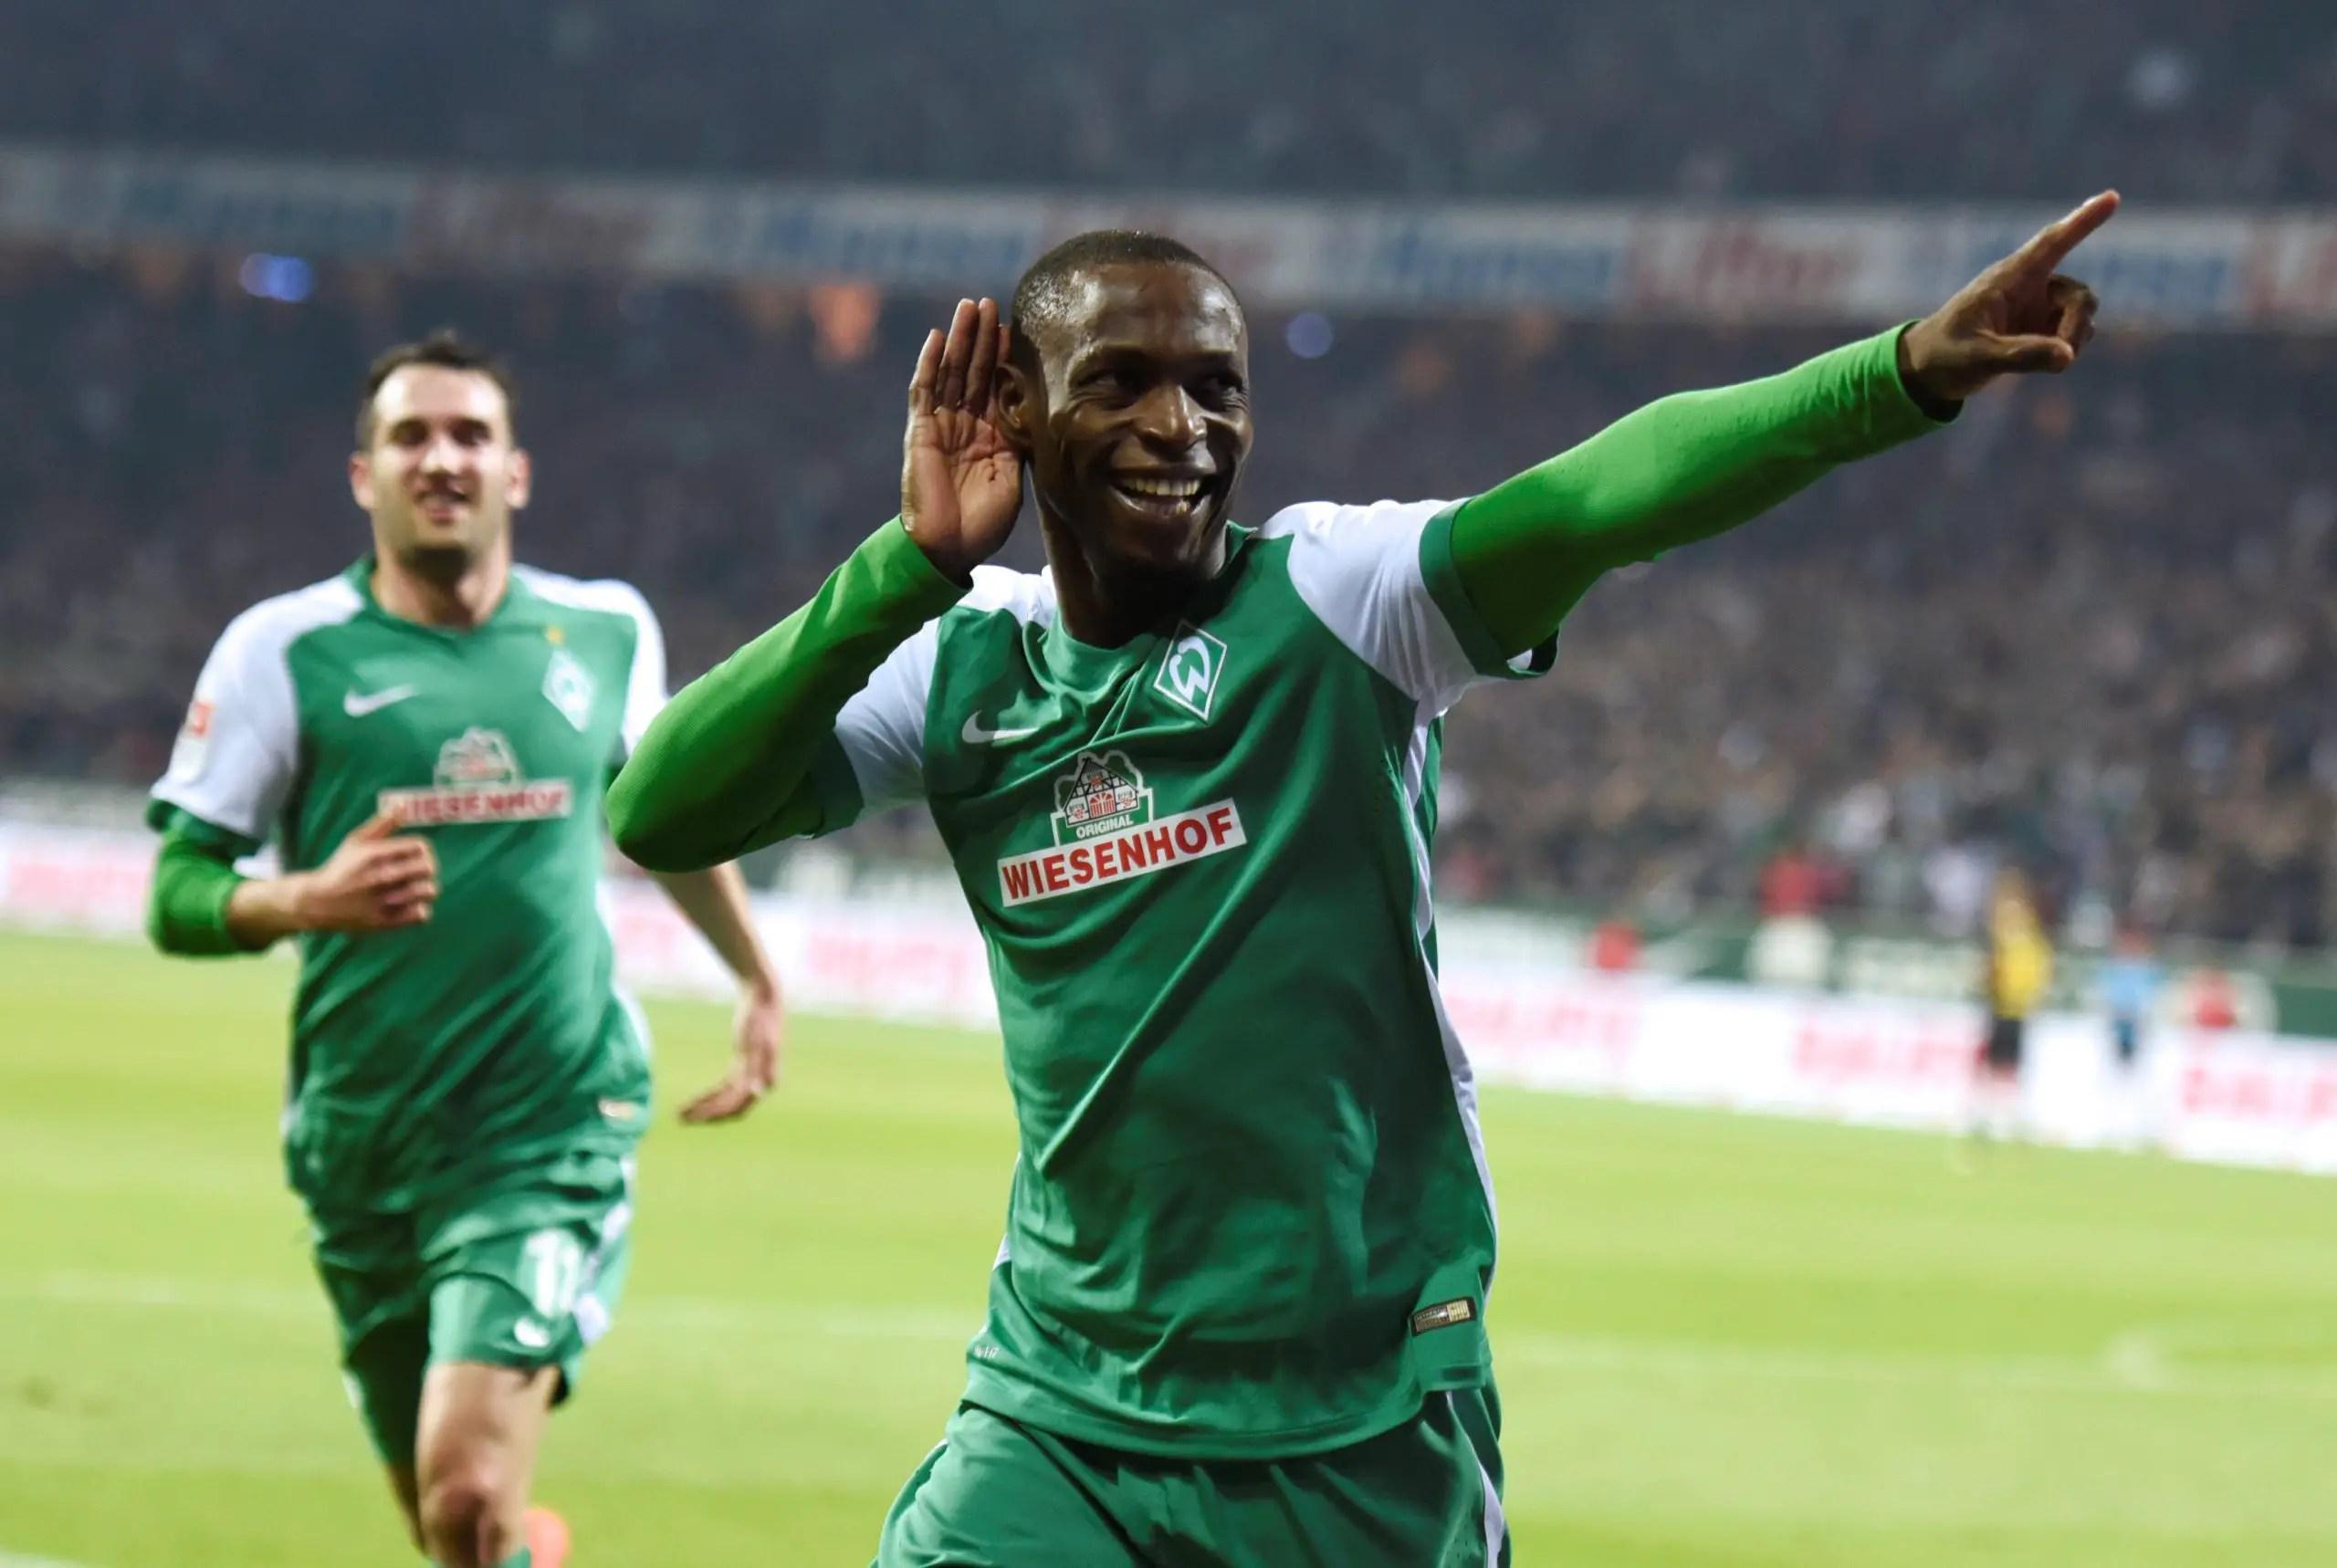 Bundesliga: Union Berlin's Ujah Ready  For Special Clash Vs Cologne